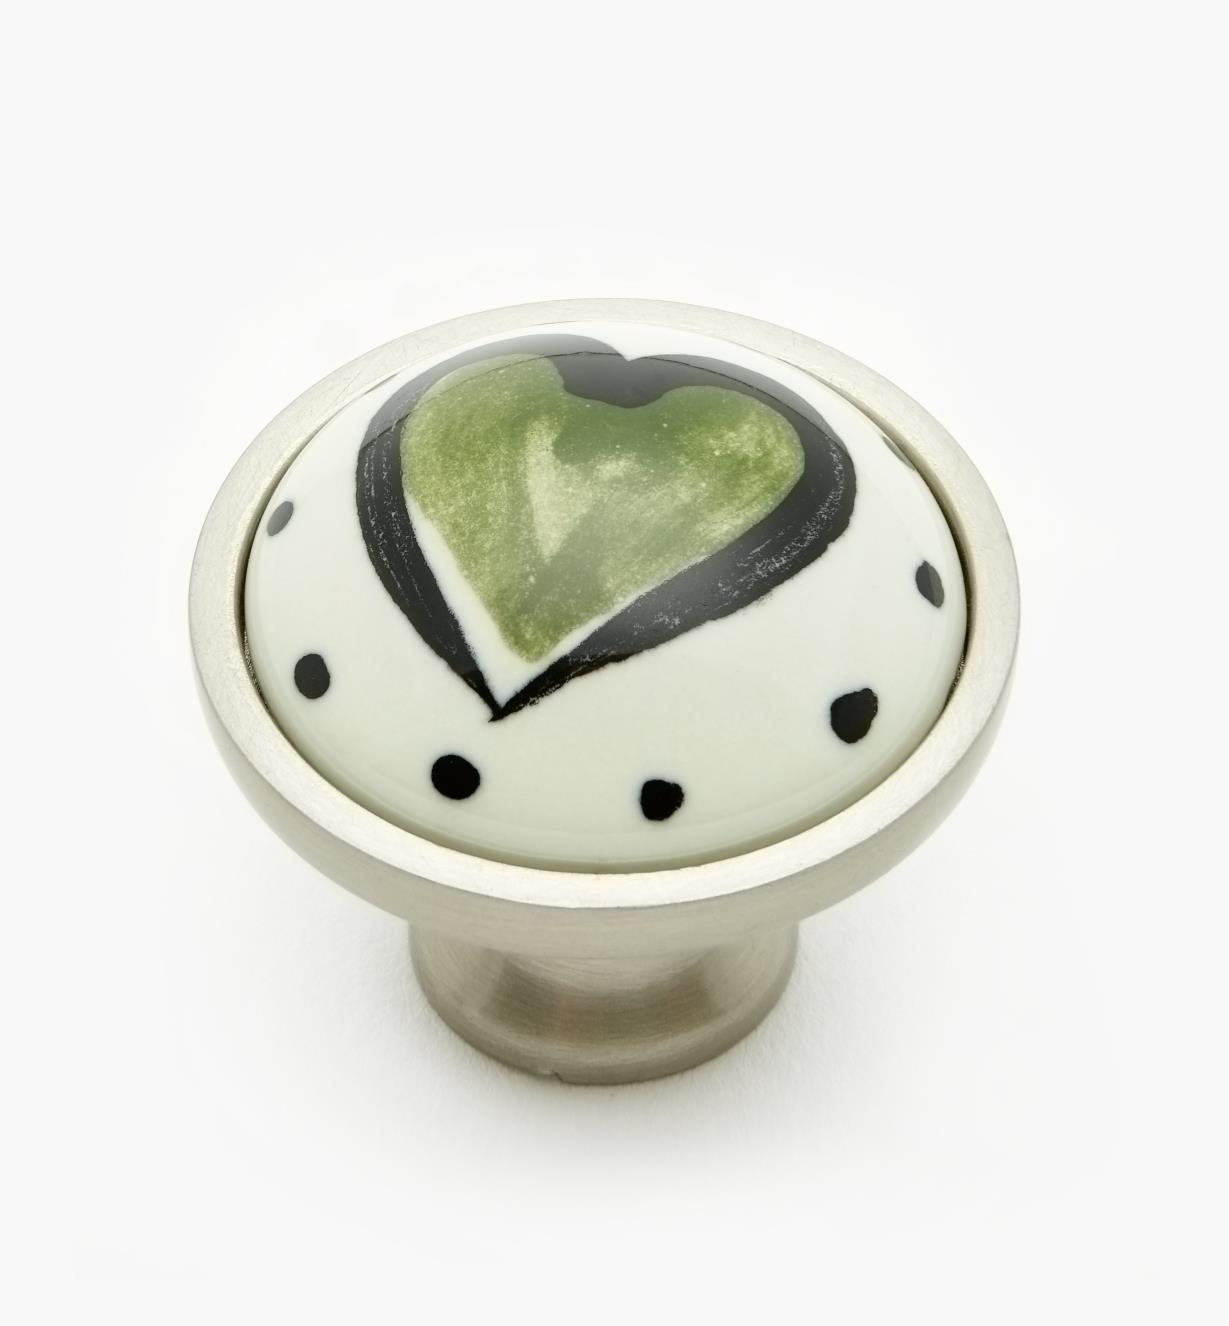 "99W9603 - 34mm (1 5/16"") Green Heart Knob, each"